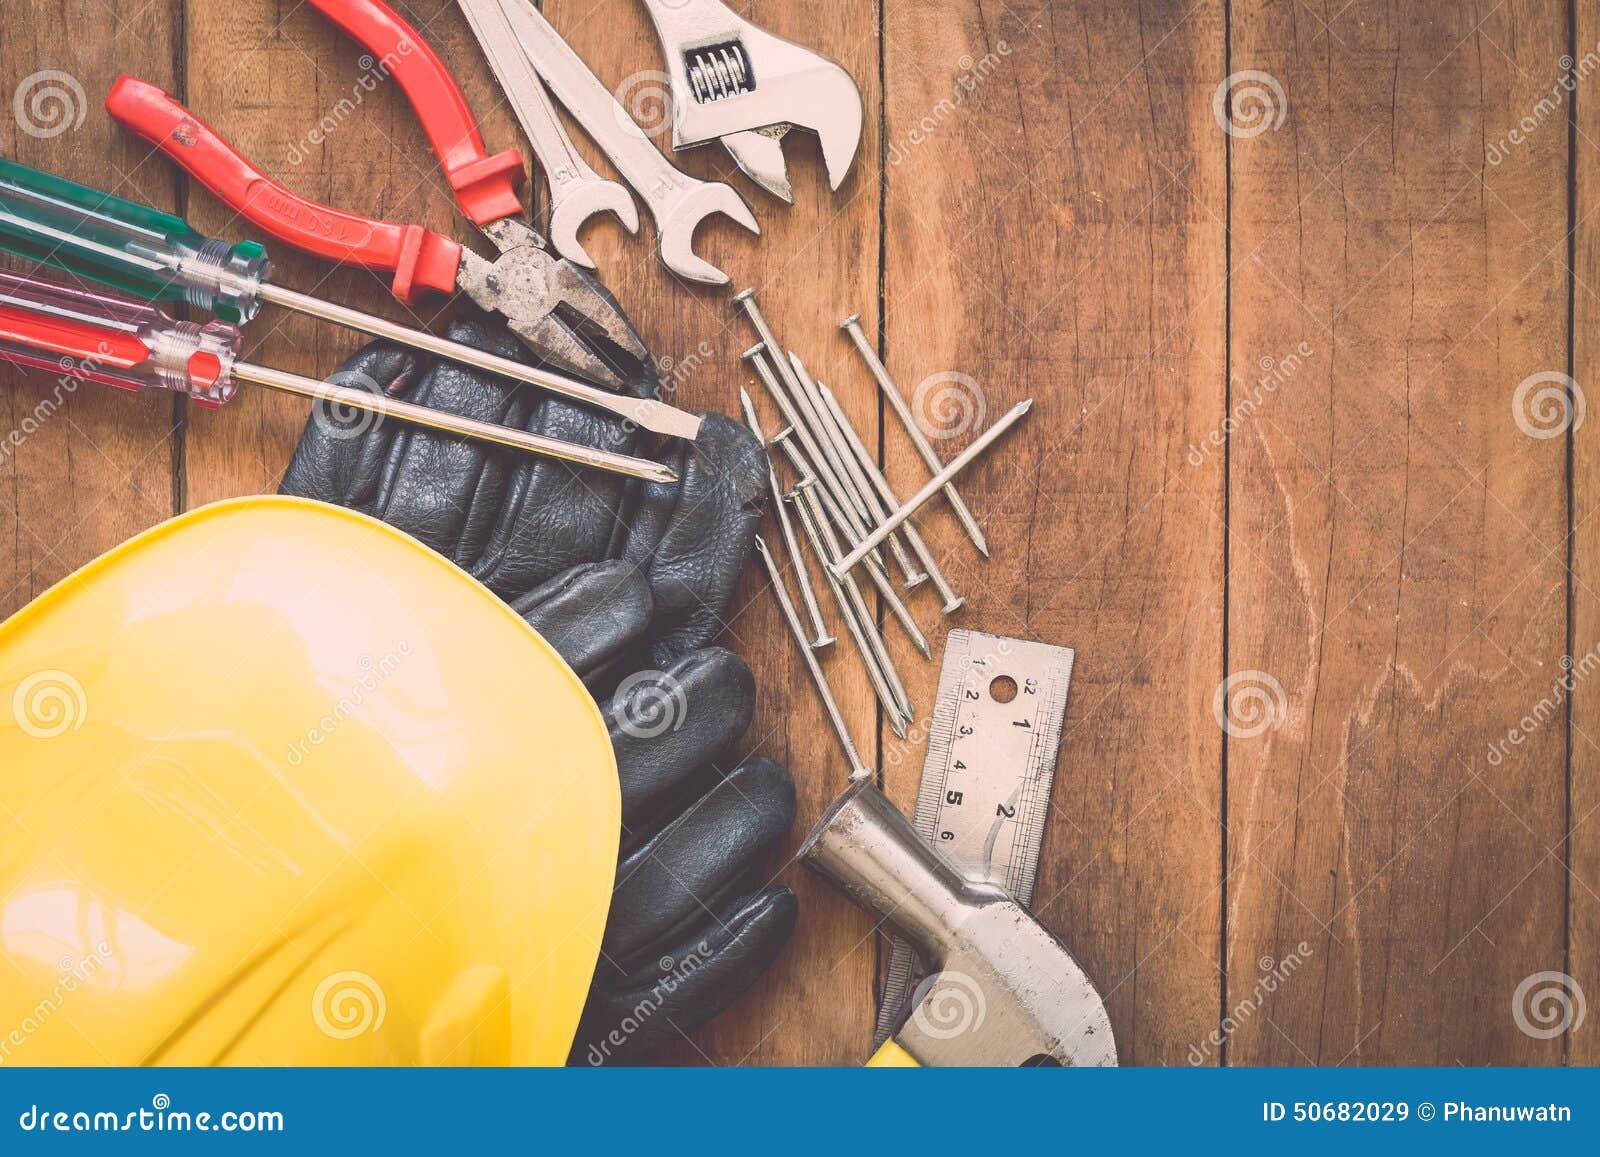 Download 在木头的被分类的工作工具 库存图片. 图片 包括有 材料, 硬件, 盔甲, 背包, 的协助, 保护, 缓和 - 50682029